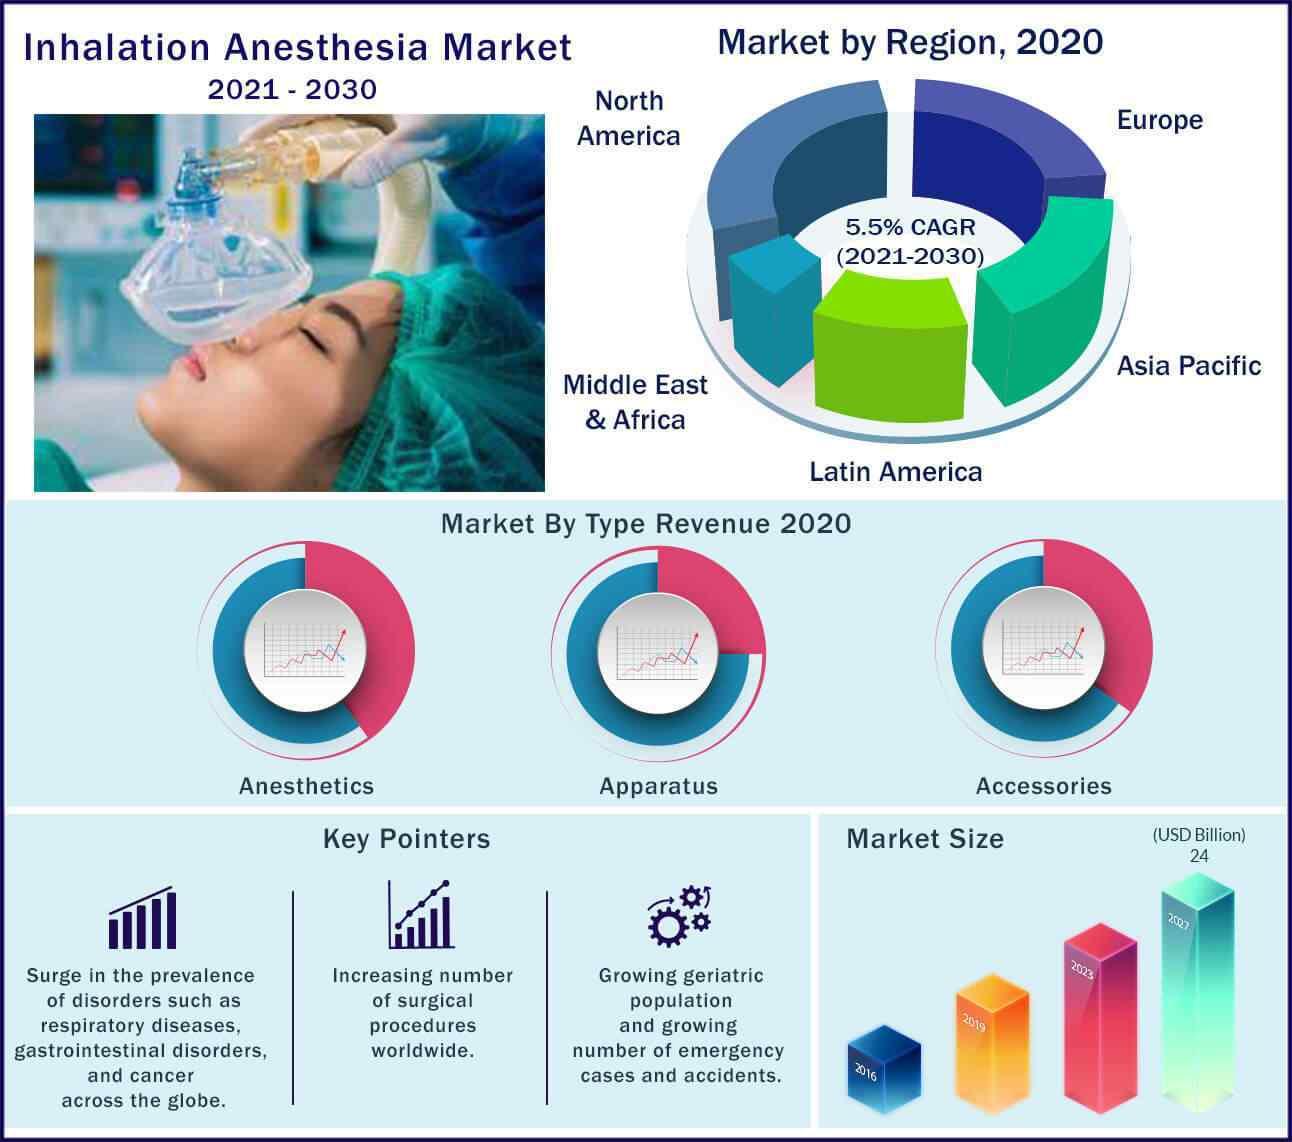 Global Inhalation Anesthesia Market 2021-2030